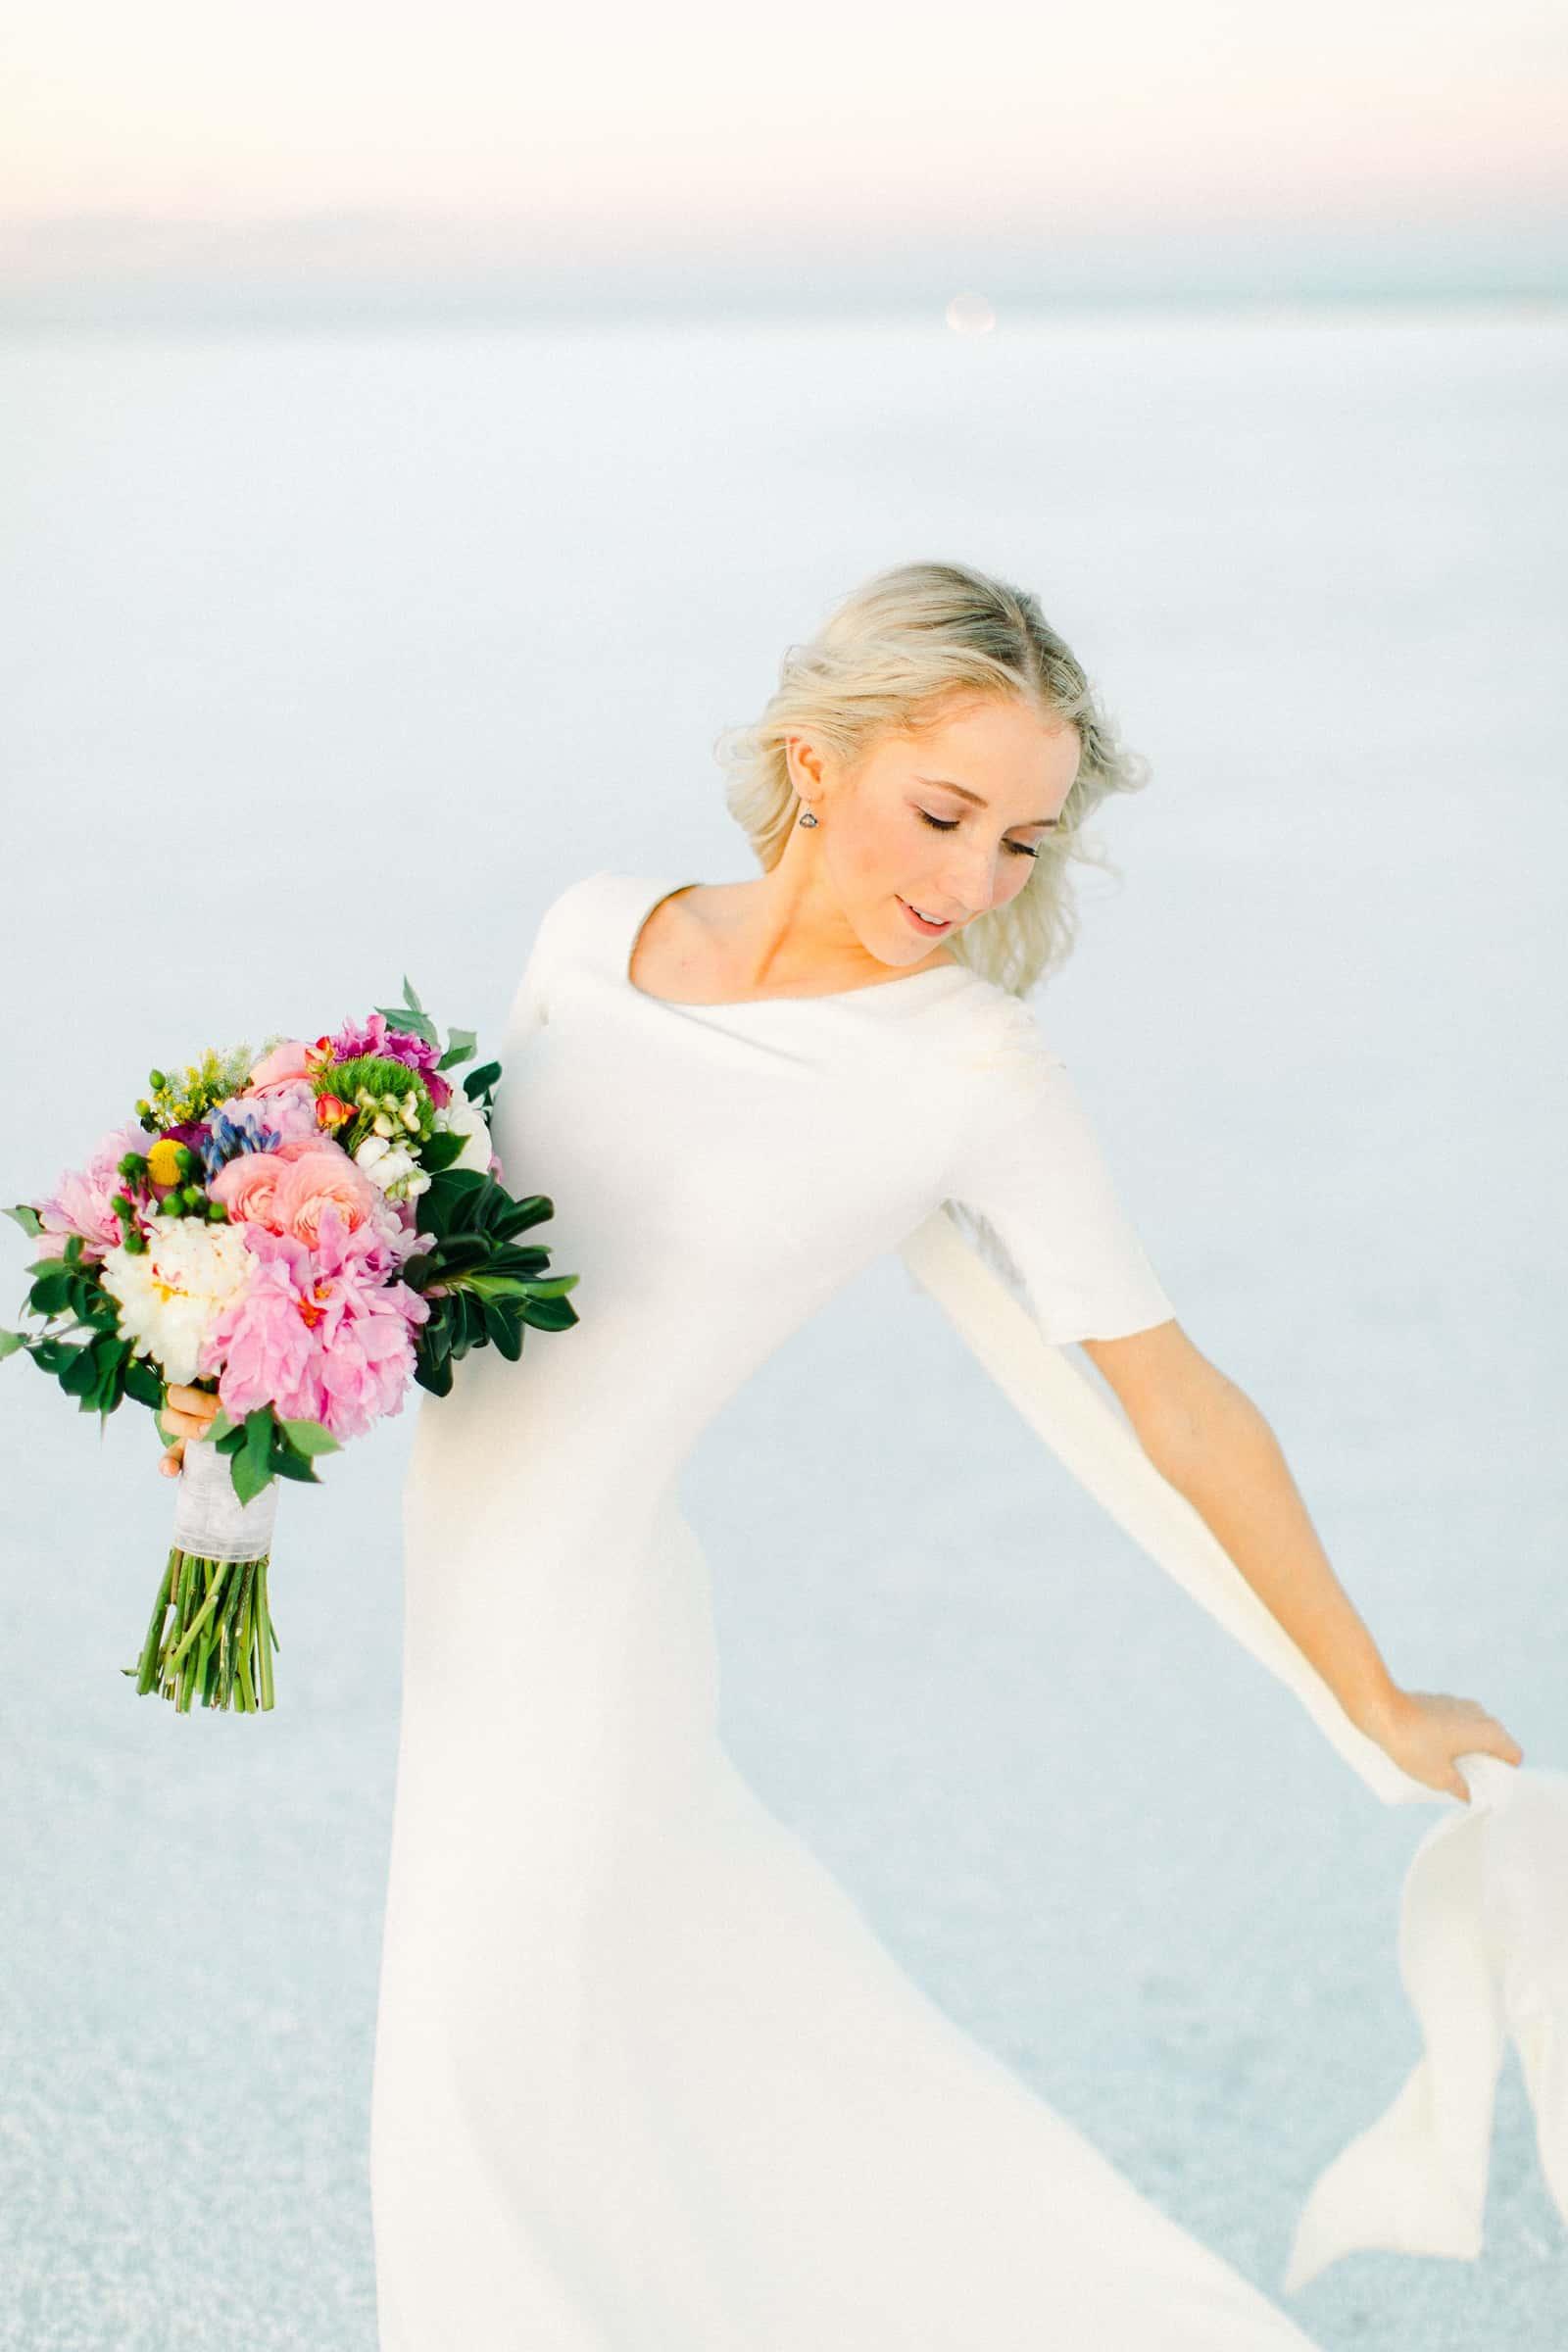 Bonneville Salt Flats Utah Wedding Photography, destination wedding, light and airy film photography, modern bride with simple sleek wedding dress